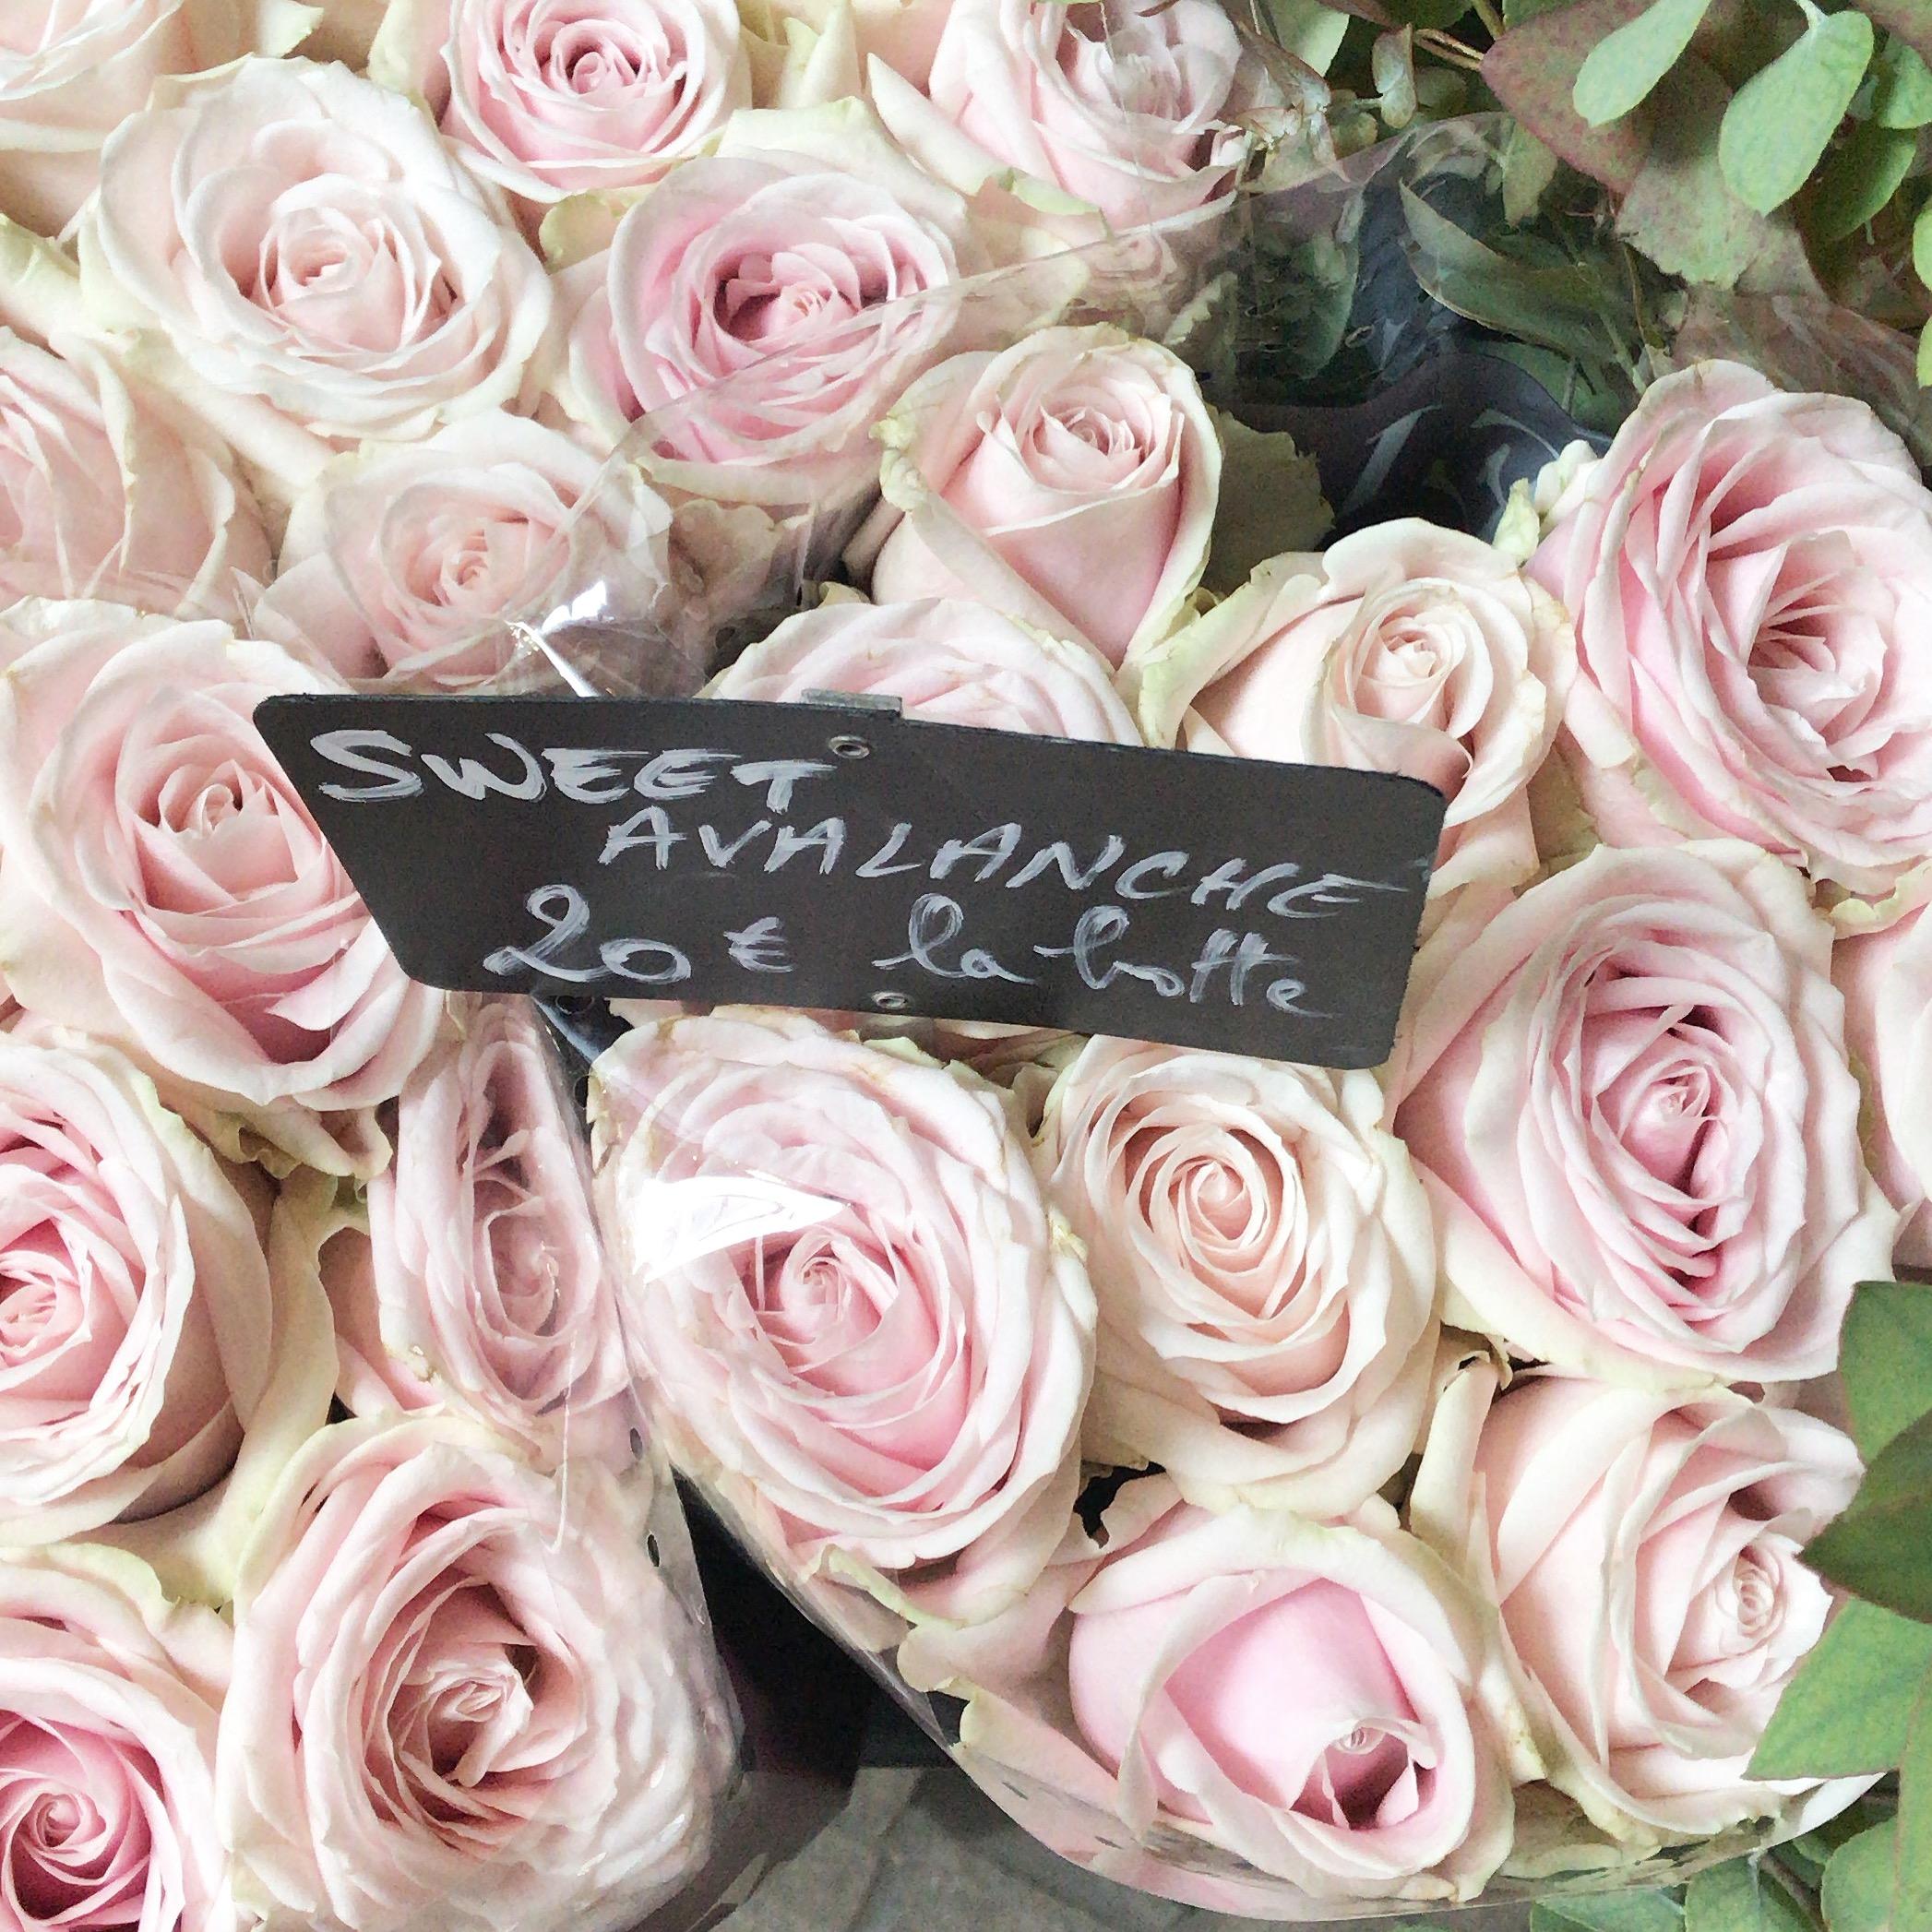 paris-flower-shop-pink-roses.jpg